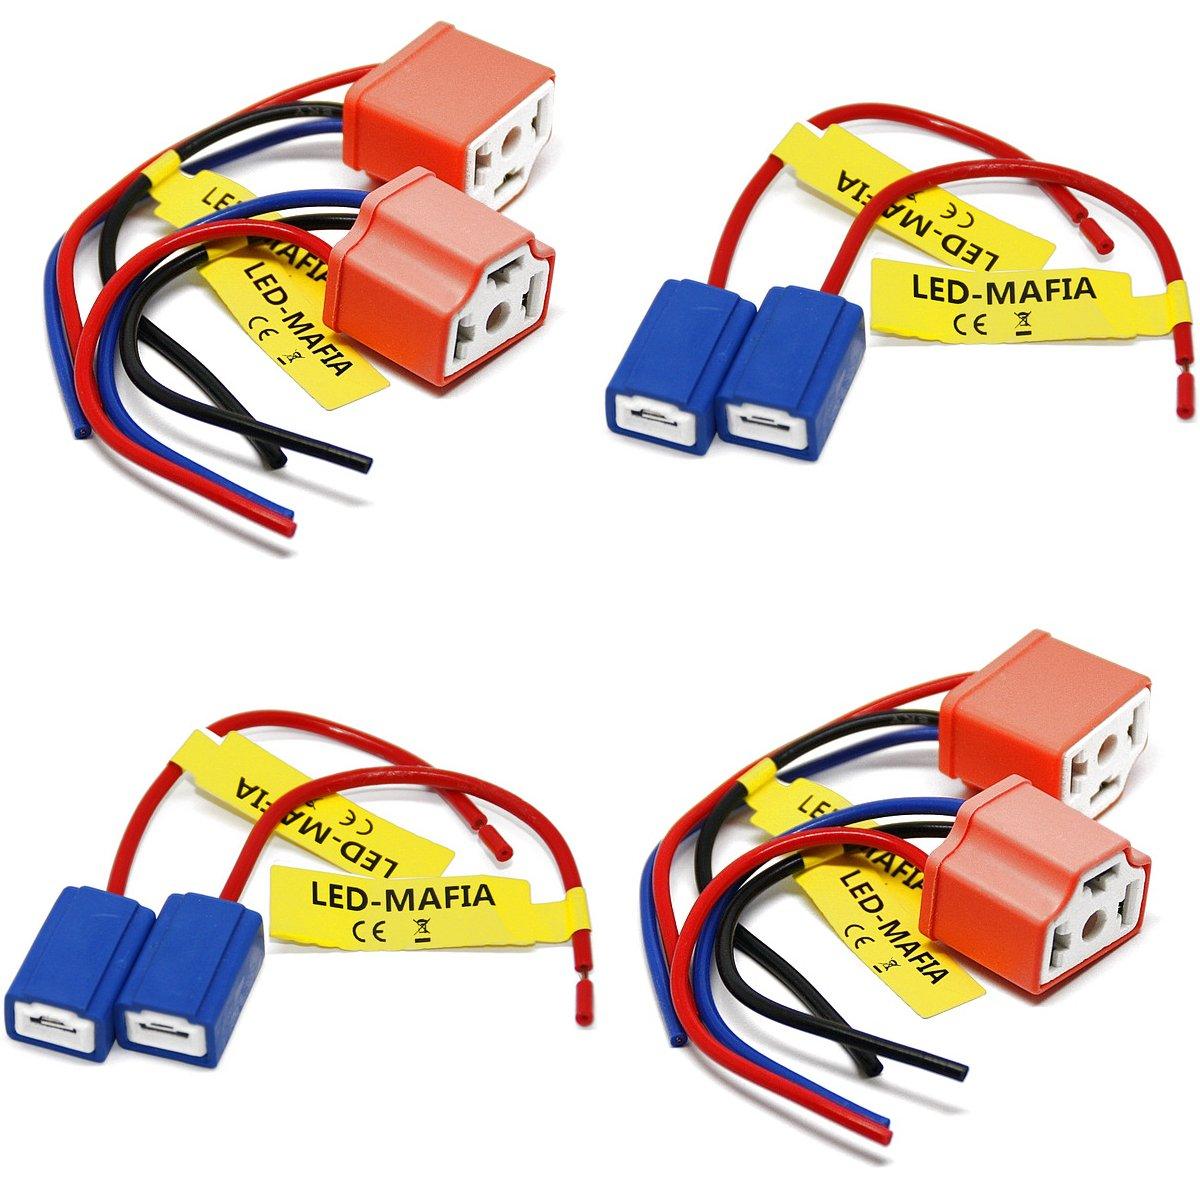 LED-Mafia 2X H1 H3 H4 LAMPENFASSUNG Halogen Lampen Fassung Keramik Stecker Kabel Sockel 2X H1